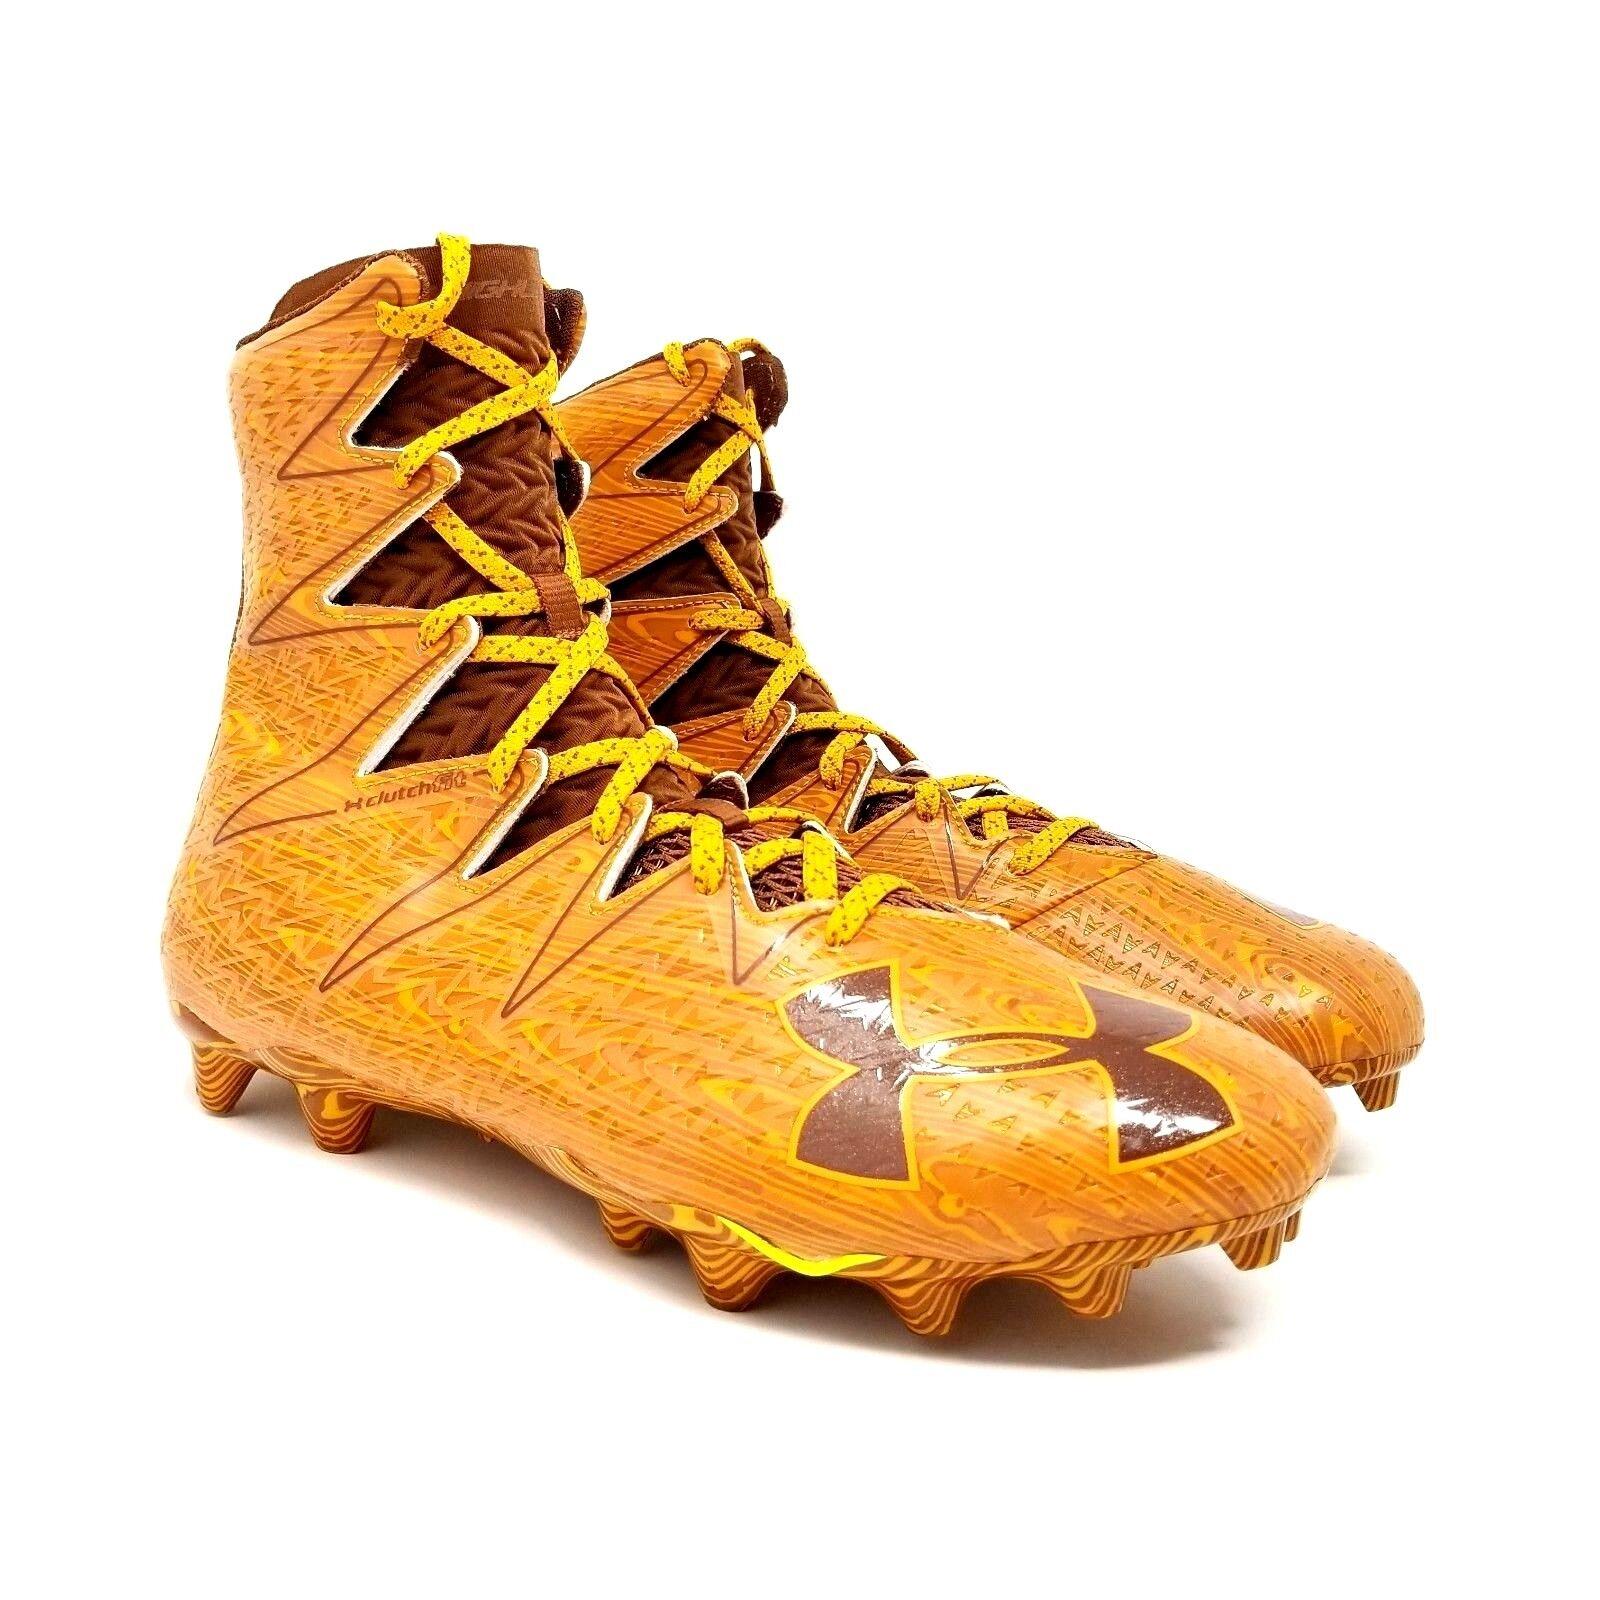 UNDER ARMOUR Uomo Highlight MC Football Wood Print Football MC Cleats Limited Ed 1275479-202 d2c641